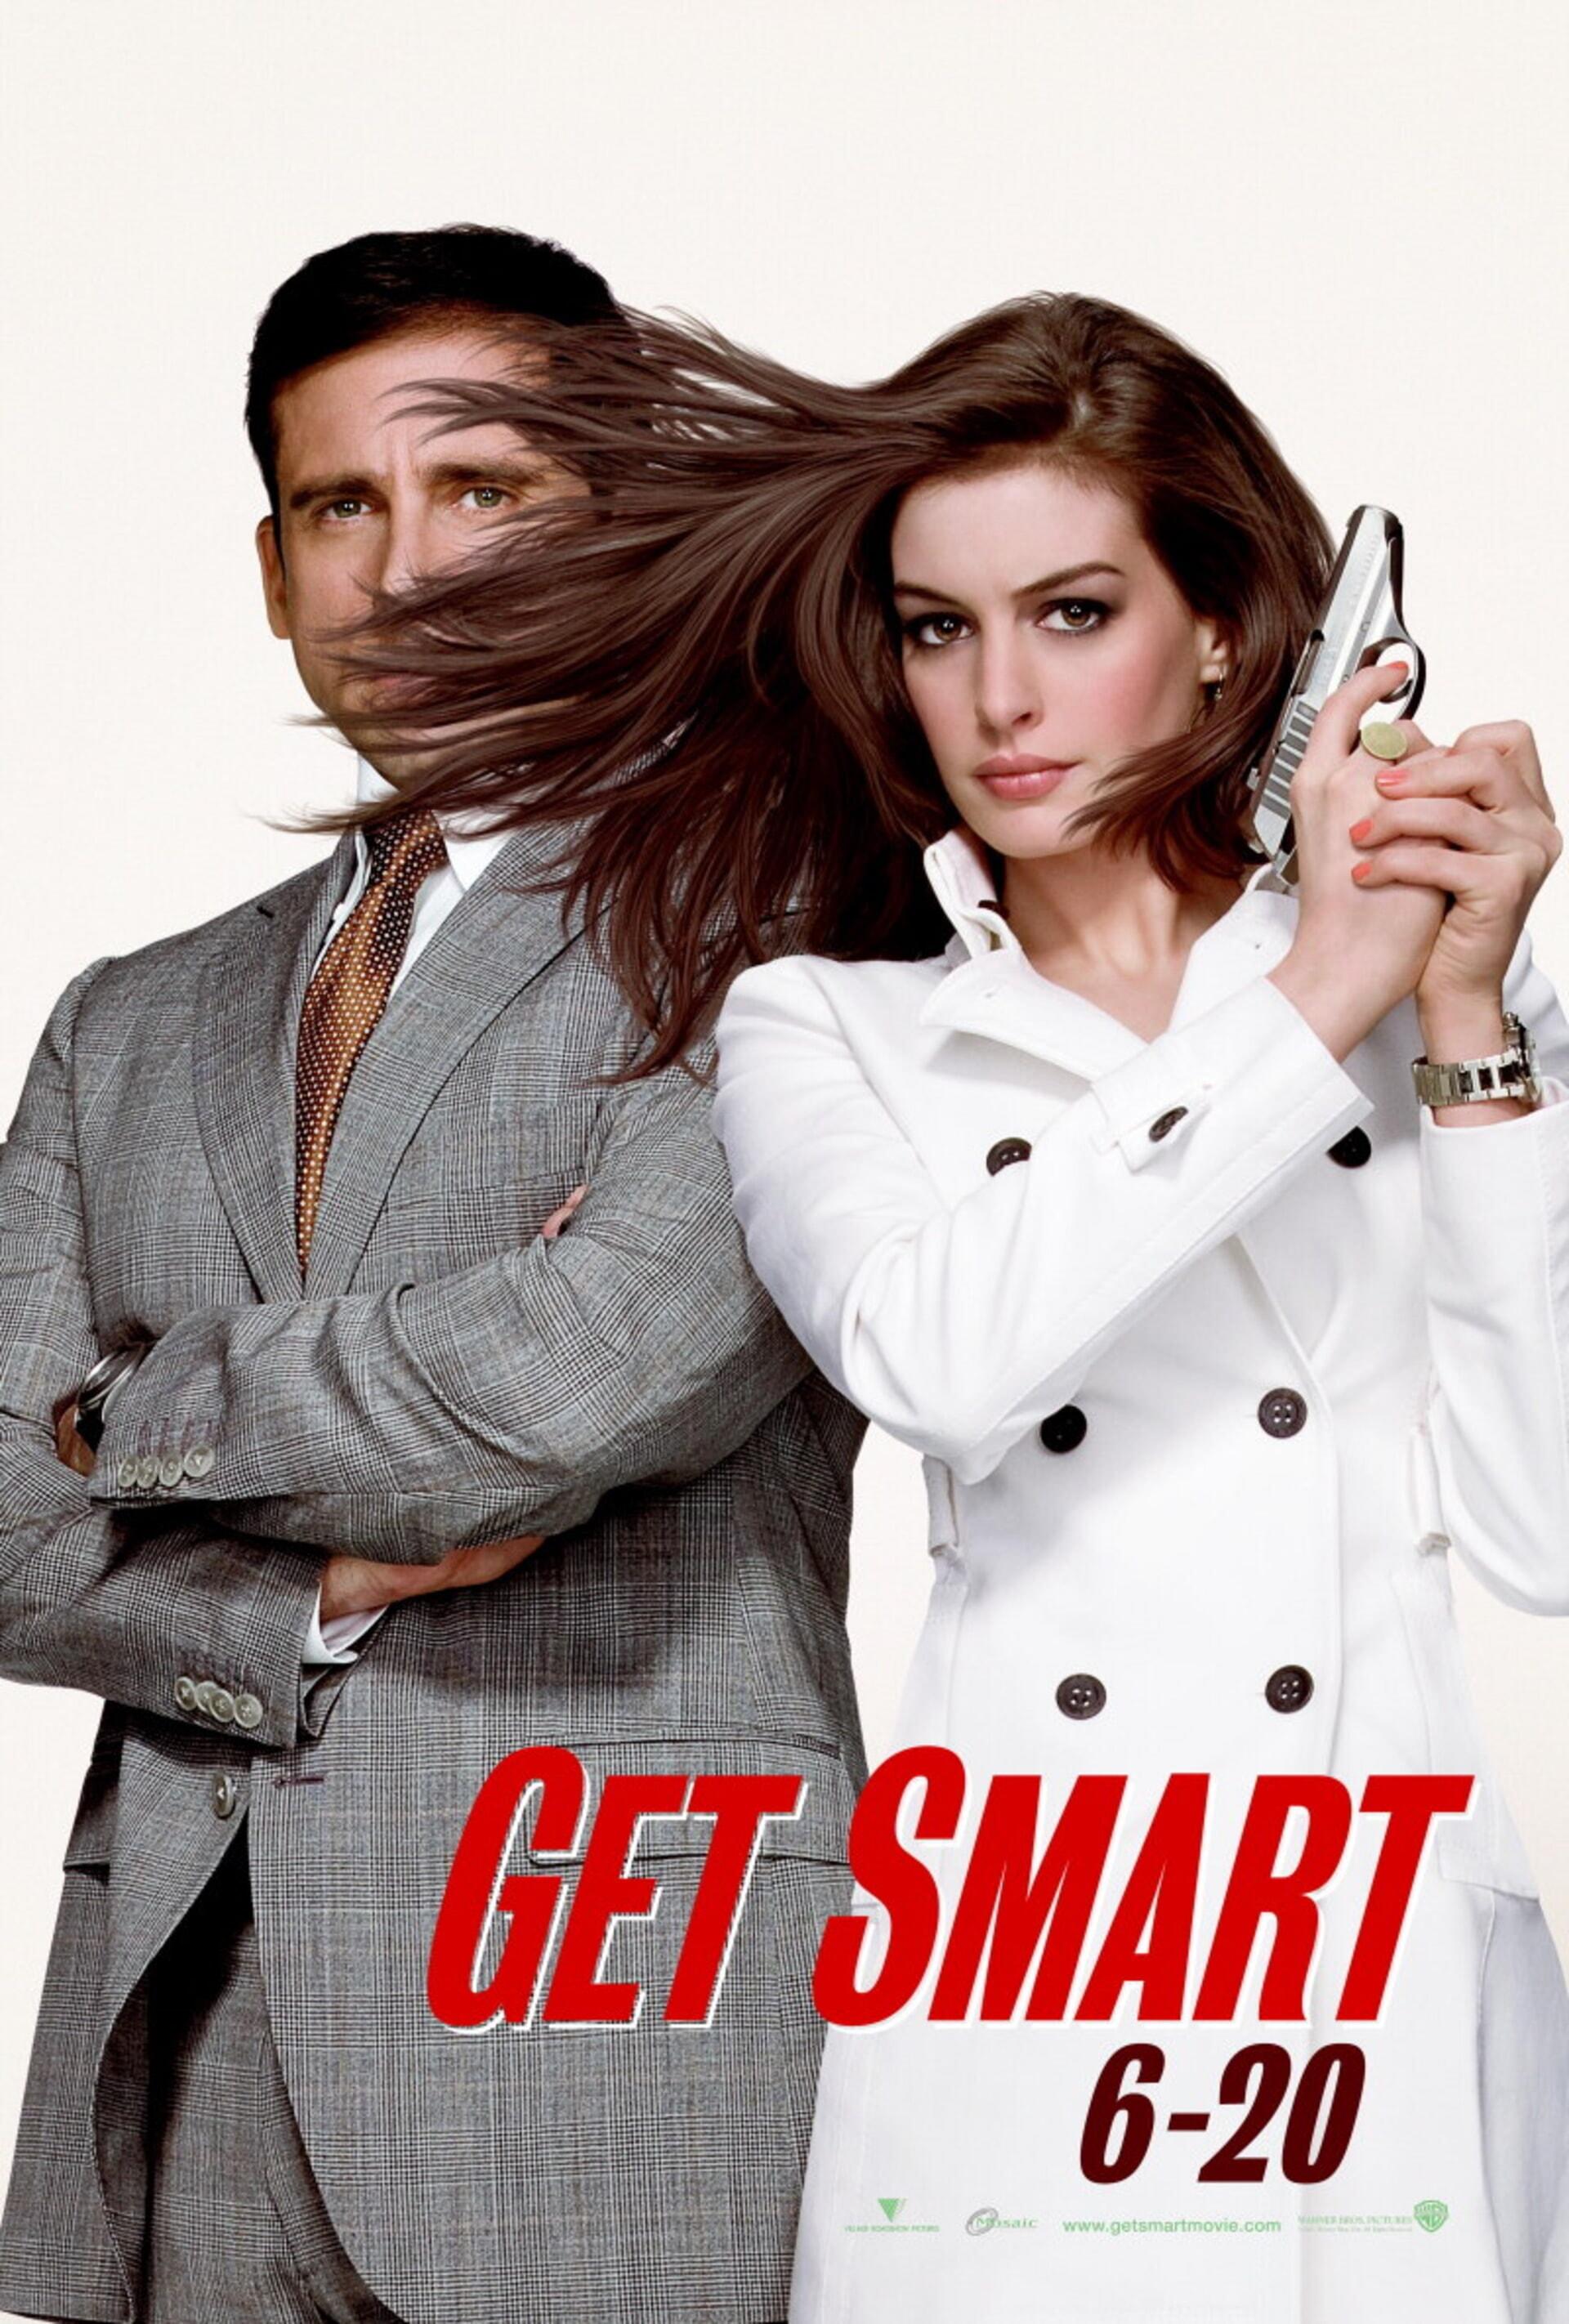 Get Smart - Poster 1